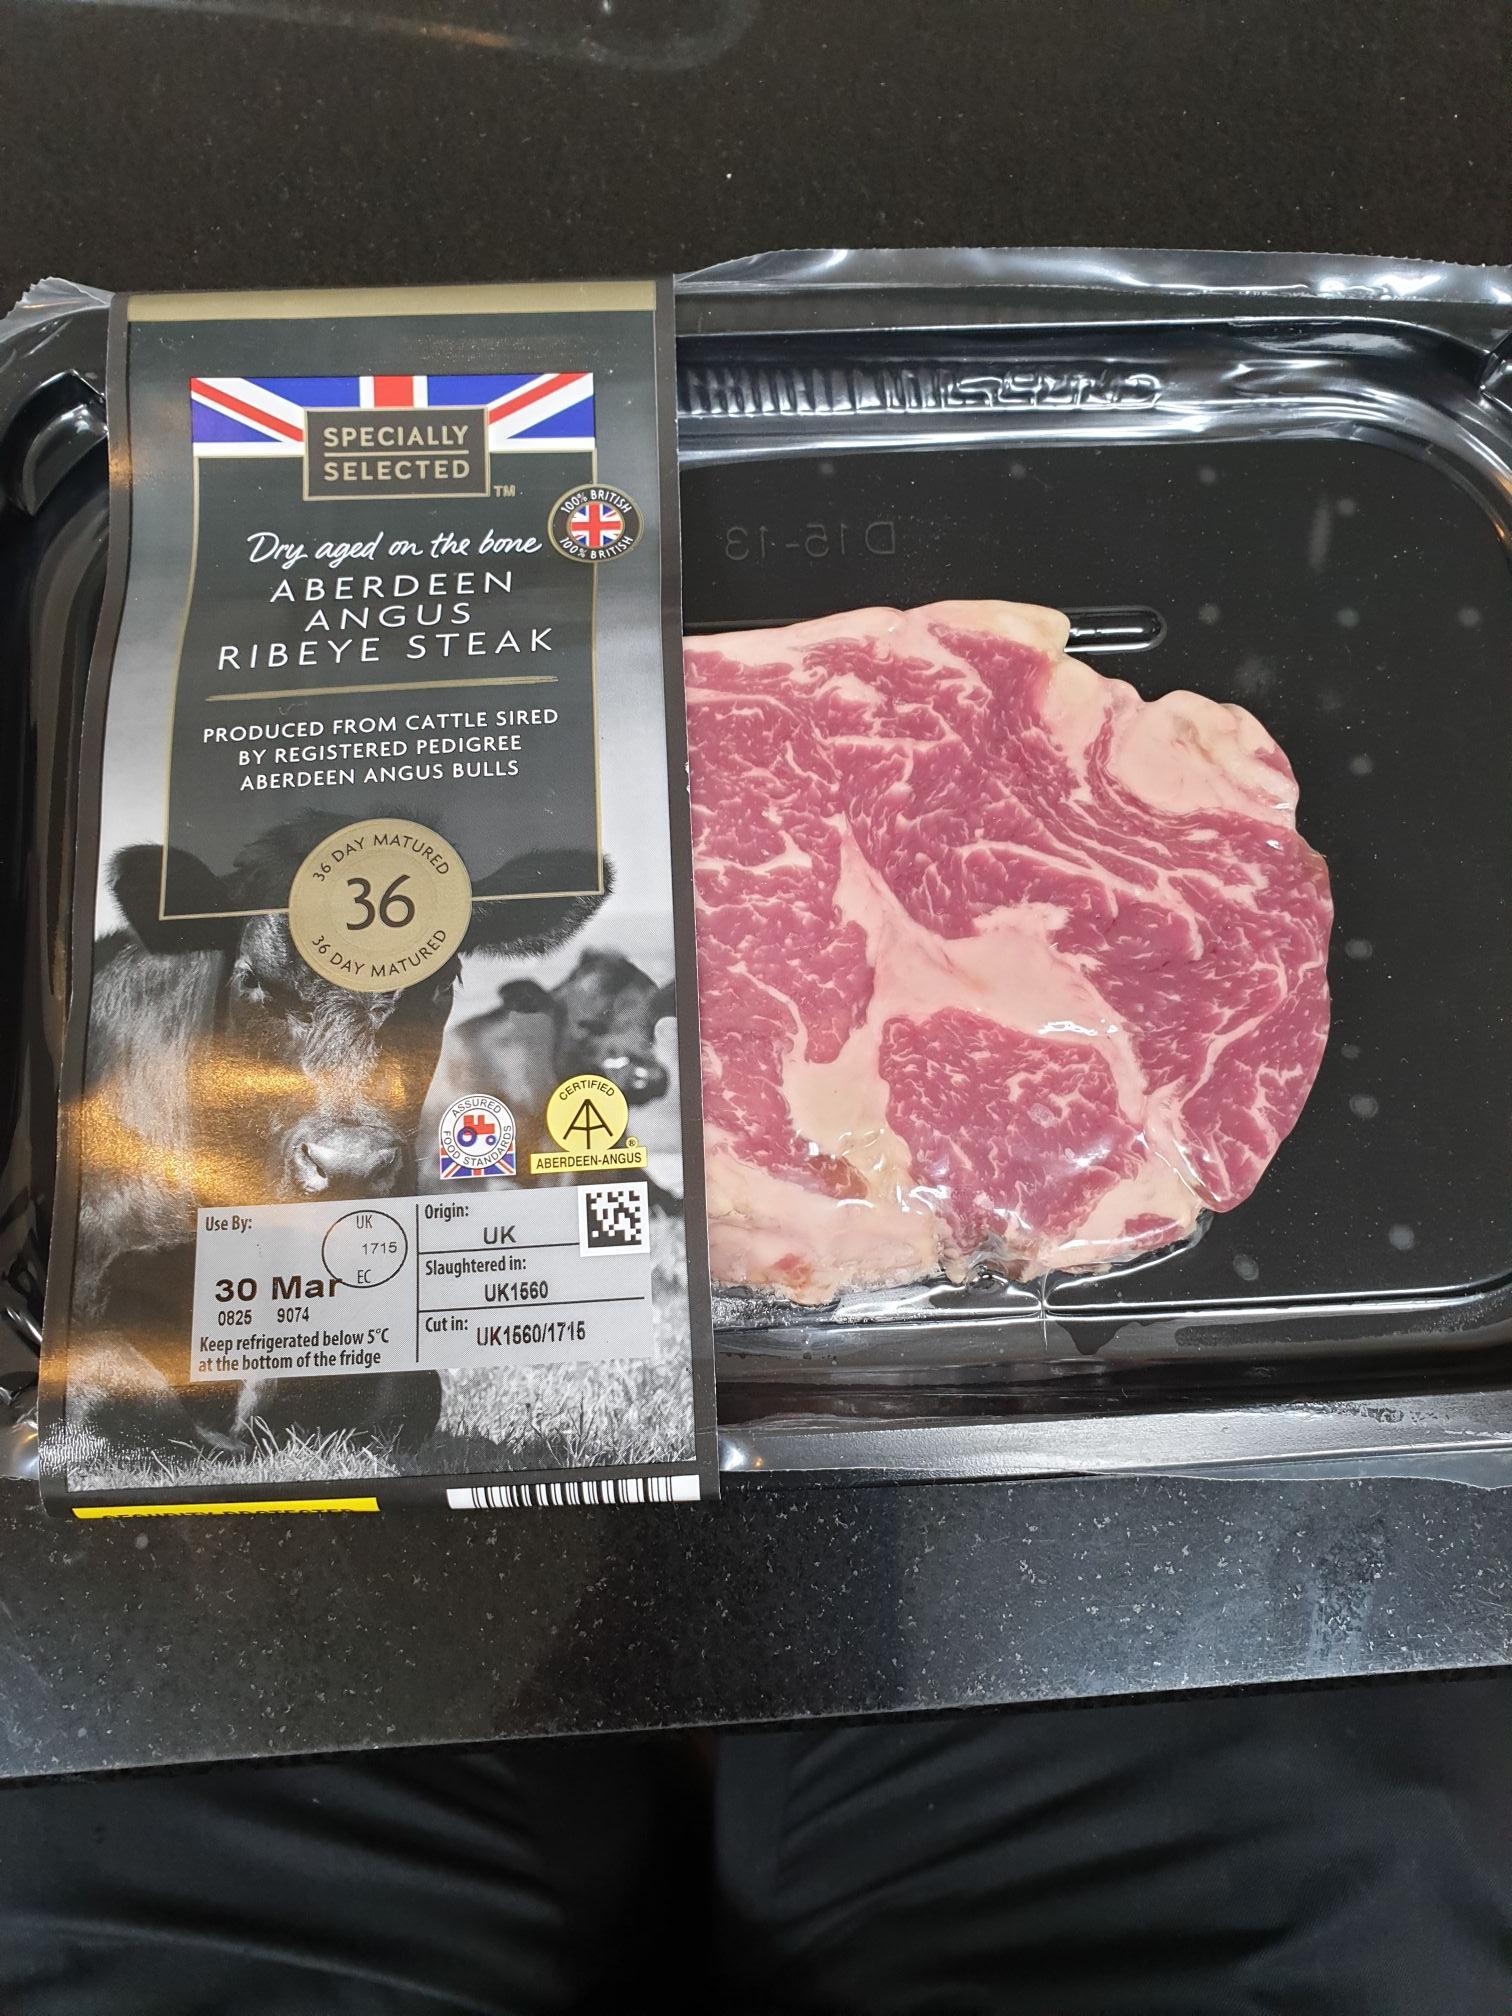 Aberdeen Angus 21 day aged rib eye steak and matured to 36 days instore at Aldi £4.49